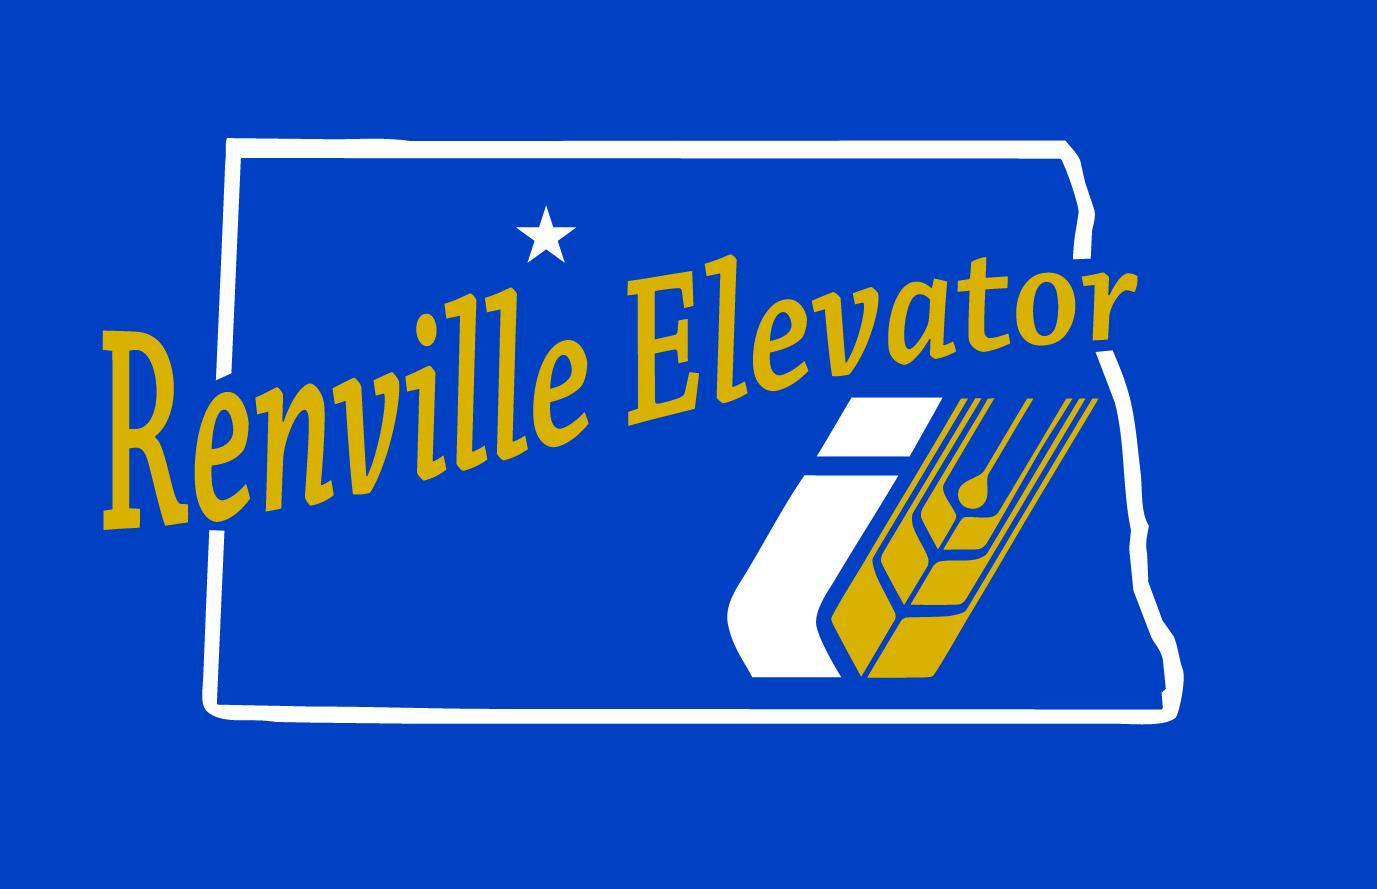 Renville Elevator Company